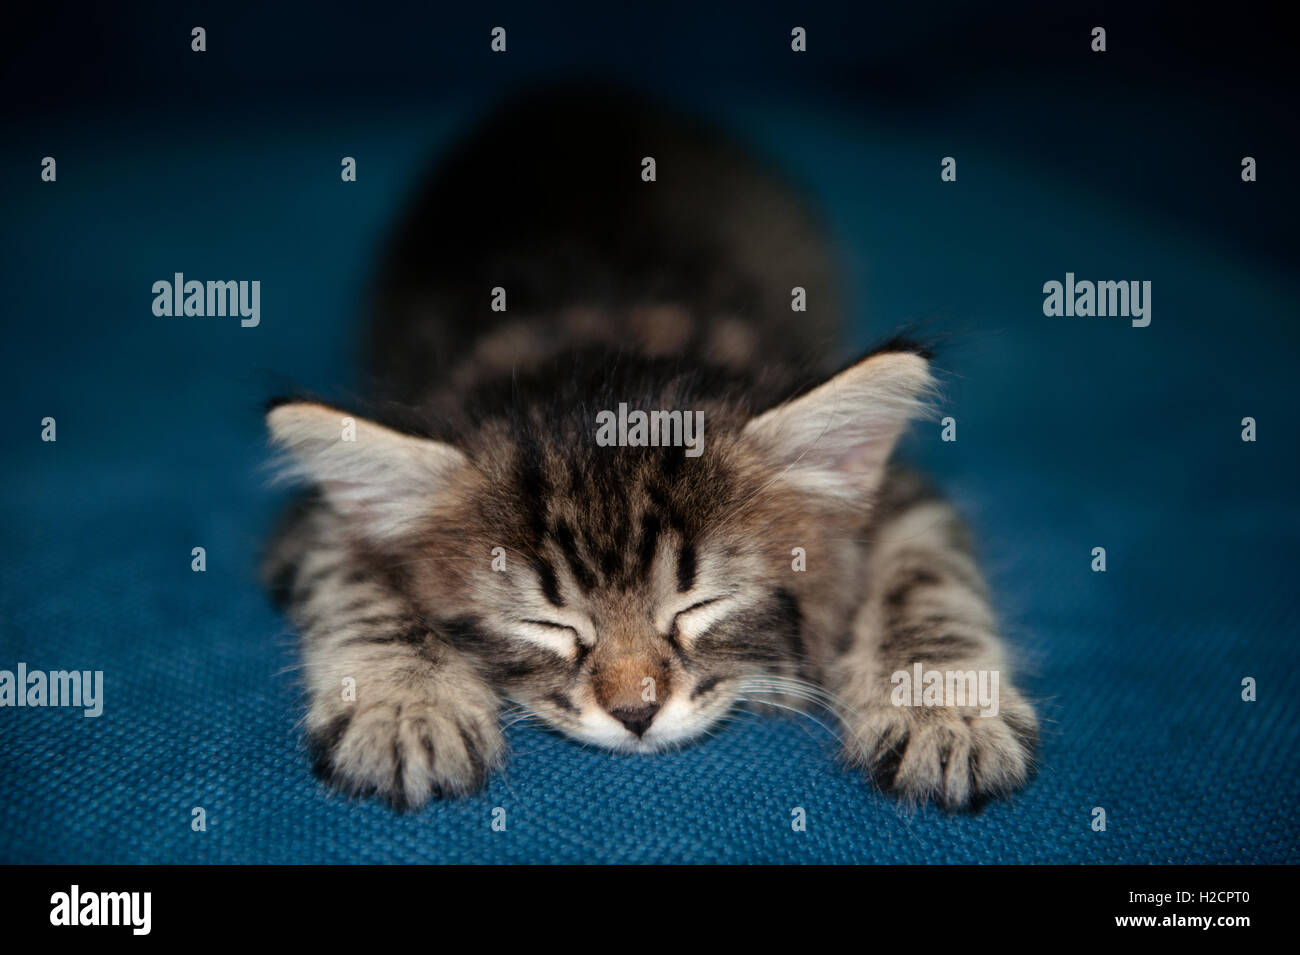 BabyTabby Kitten Sleeping - Stock Image